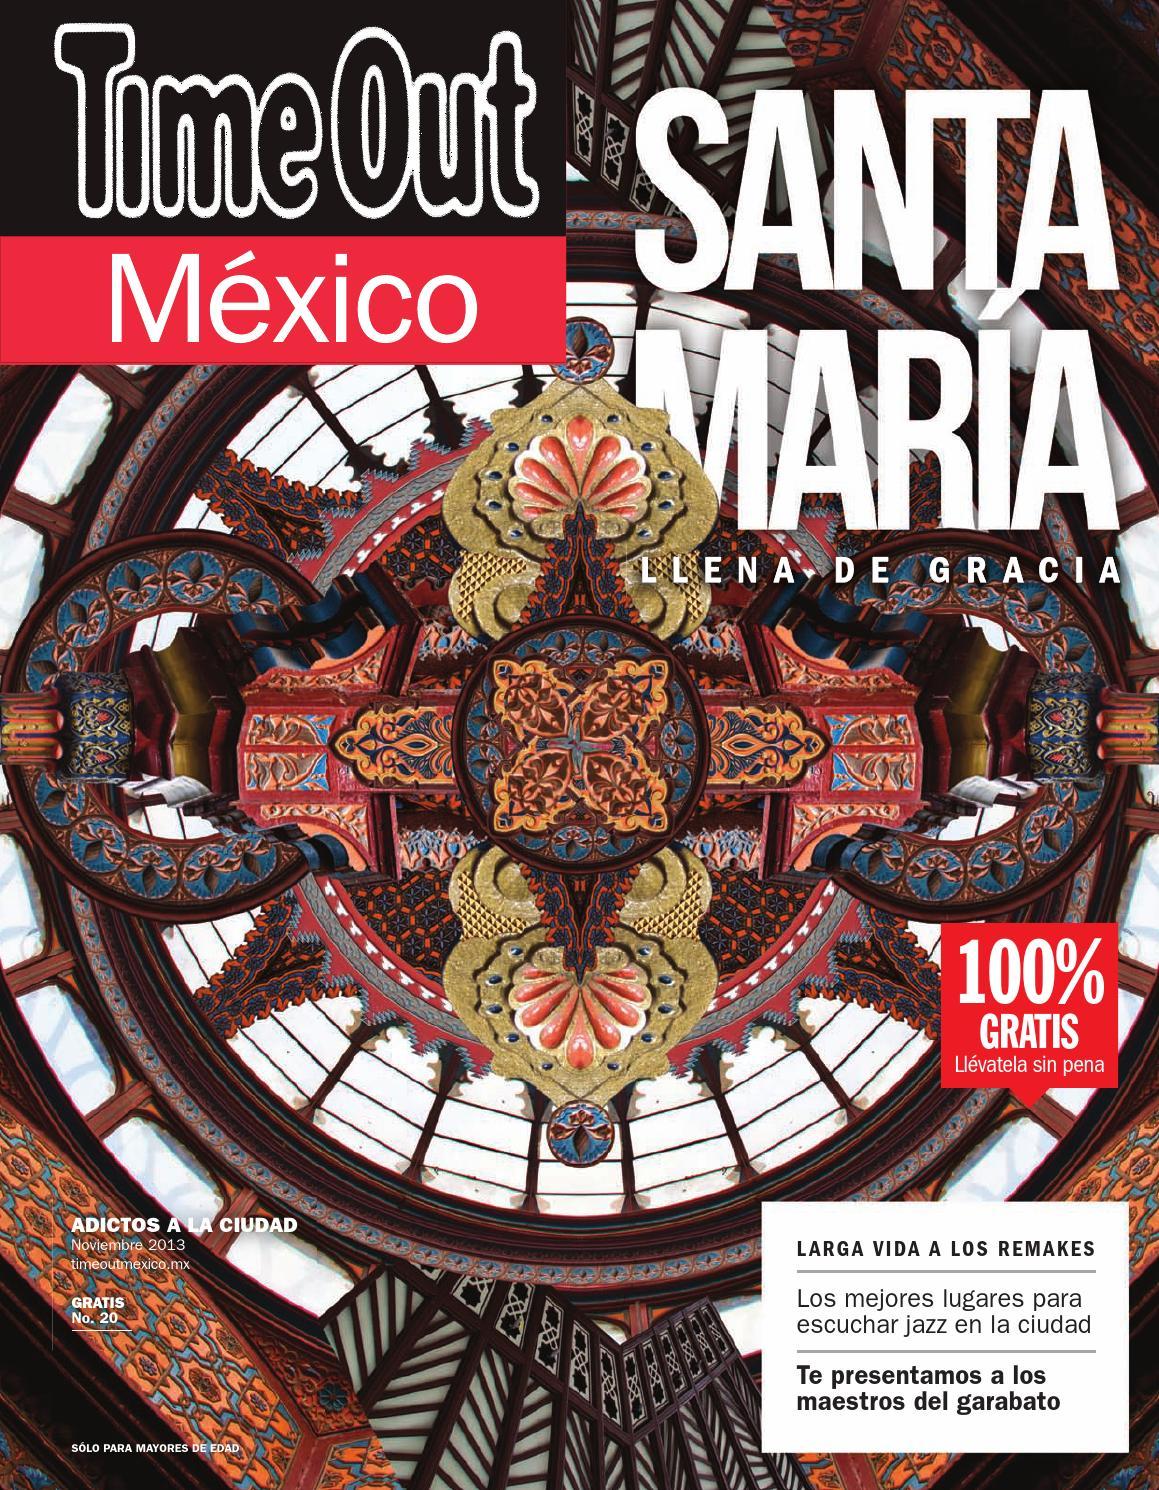 Time Out México noviembre 2013 by Time Out México - issuu 75da1894795